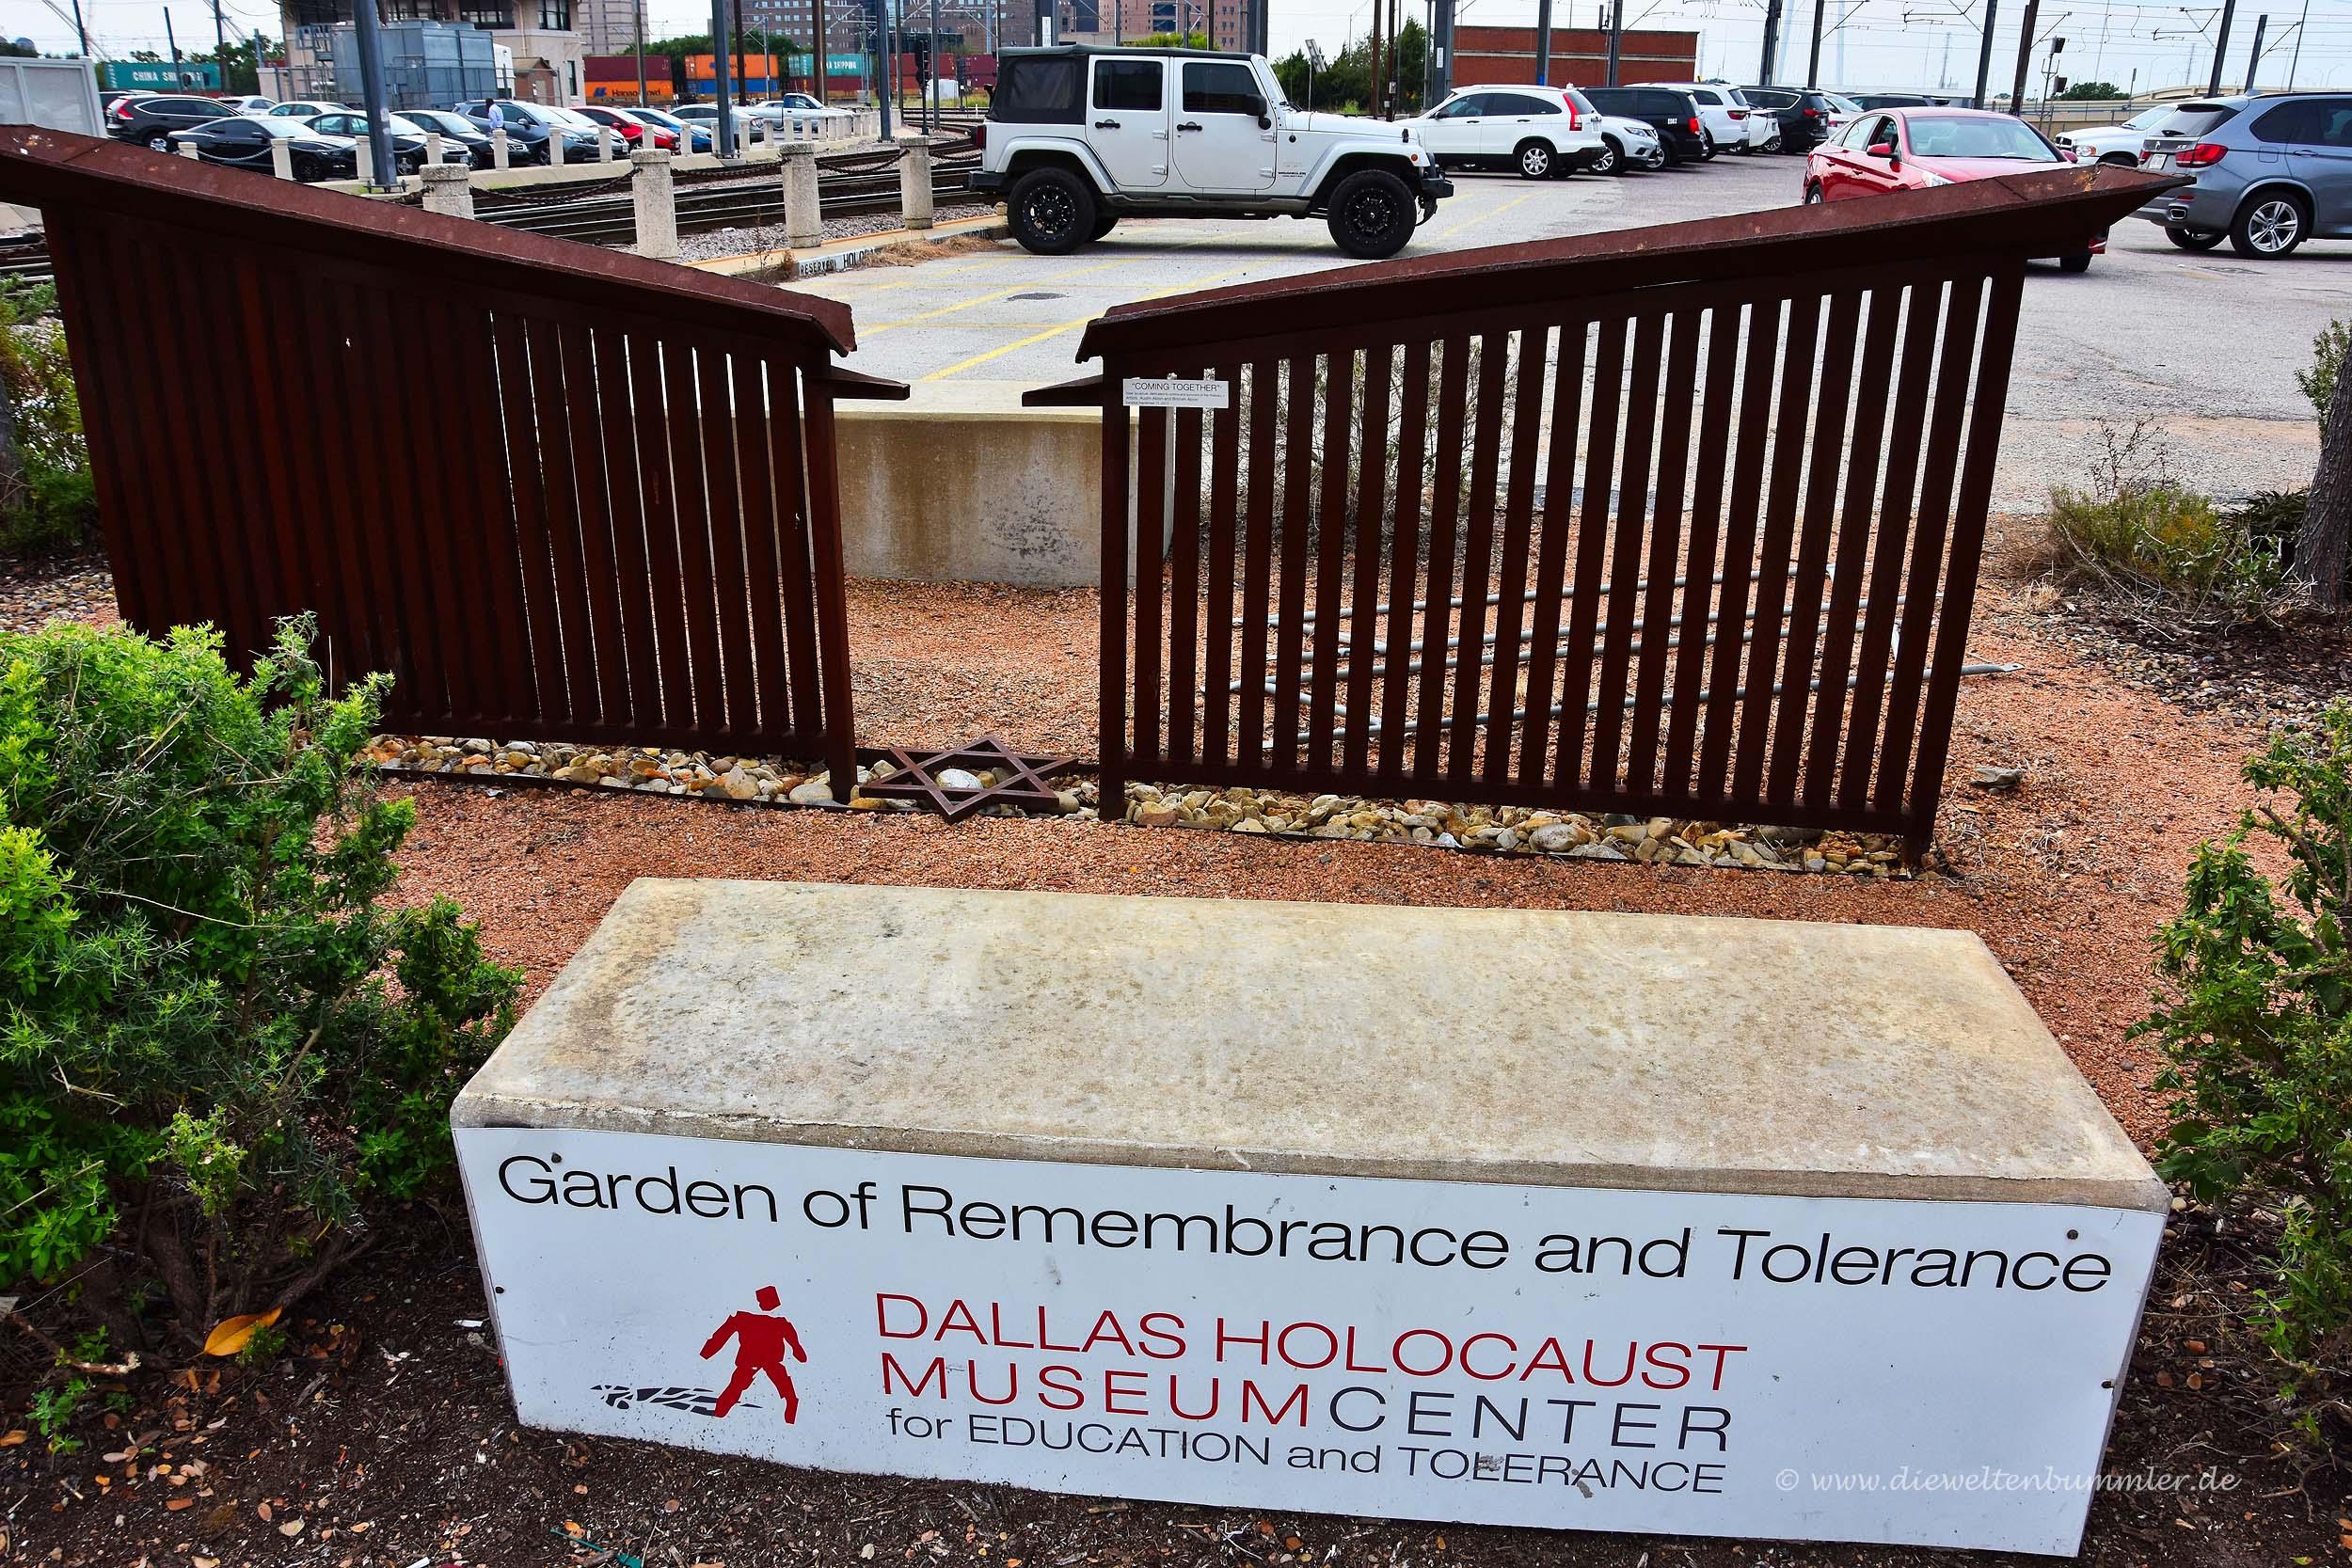 Holocaust-Mahnmal in Dallas